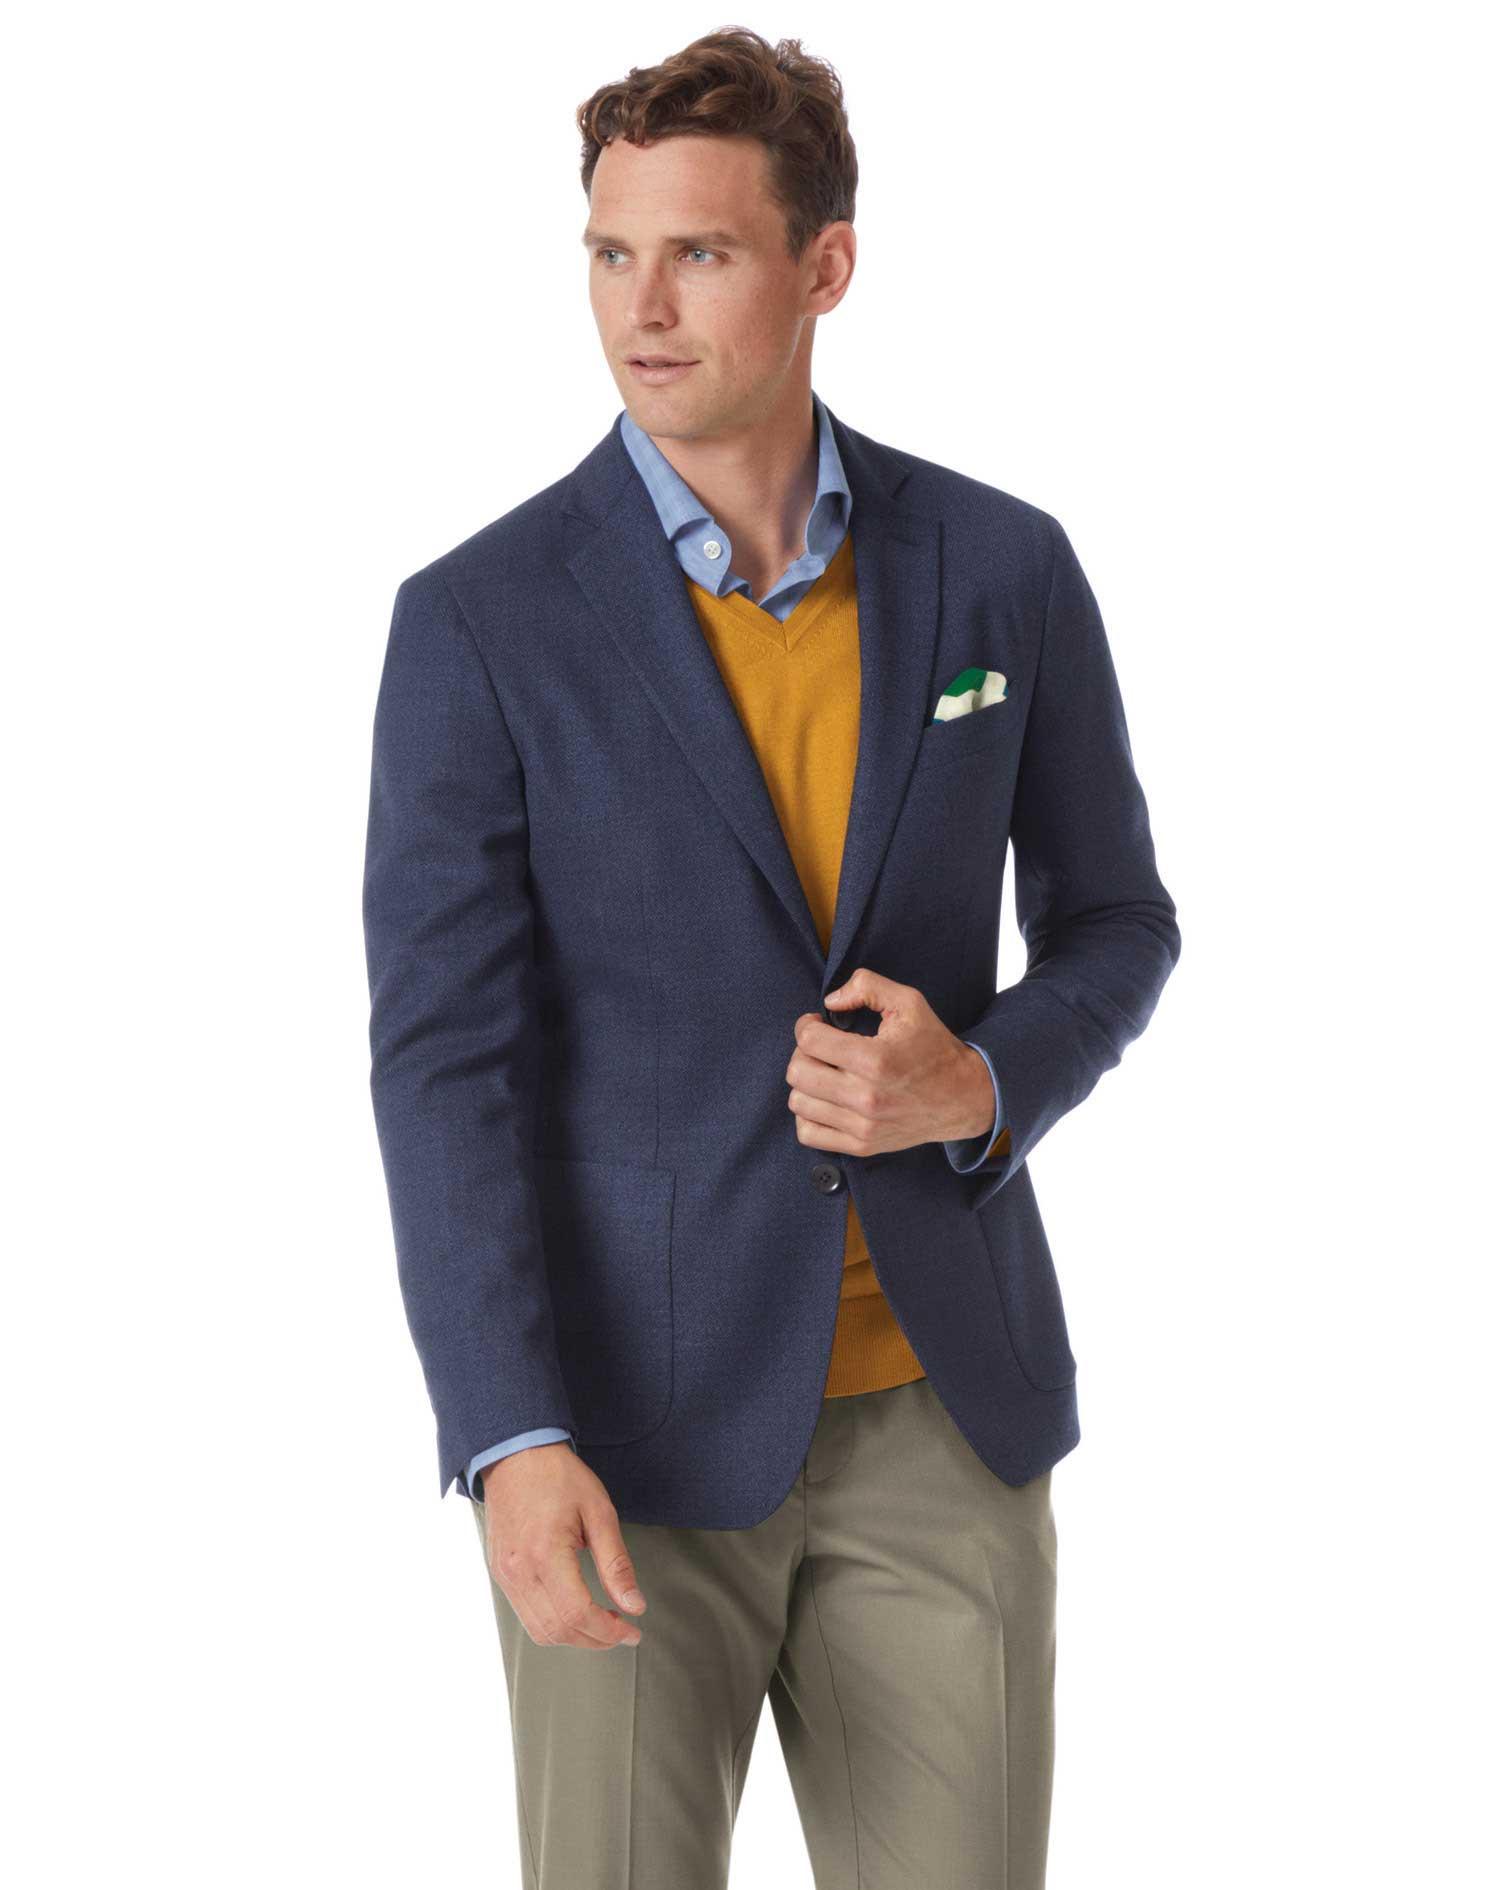 Slim Fit Indigo Blue Italian Wool Blazer Size 40 Short by Charles Tyrwhitt